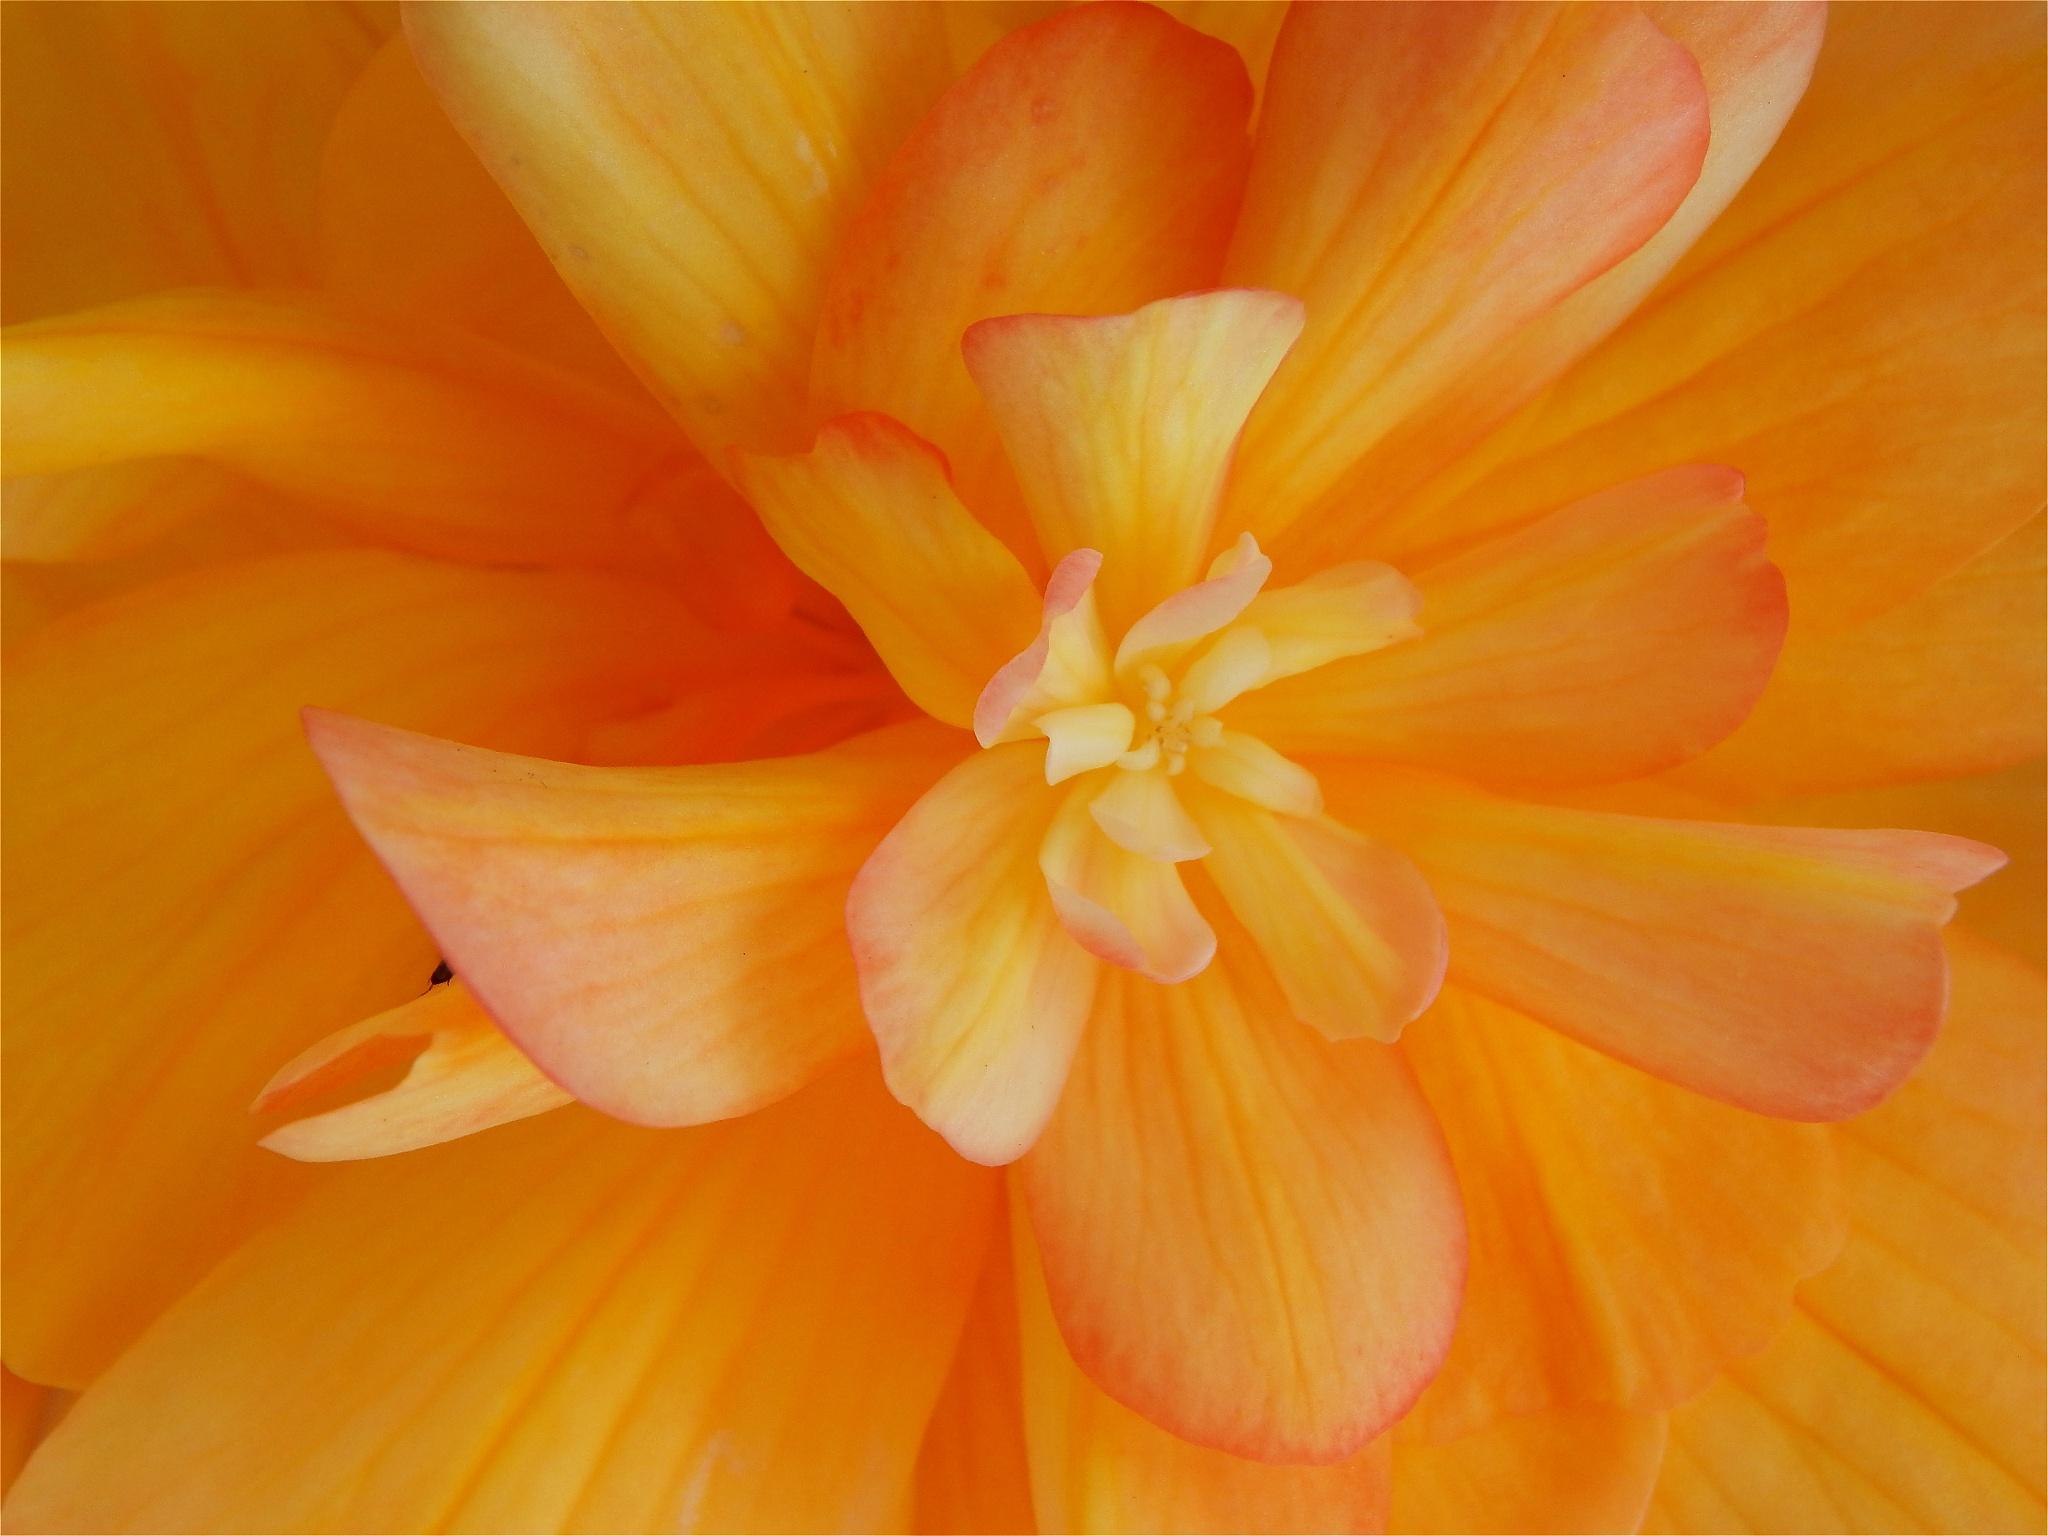 FRUIT SALAD COLOURED FLOWER by nikita.buckley.9